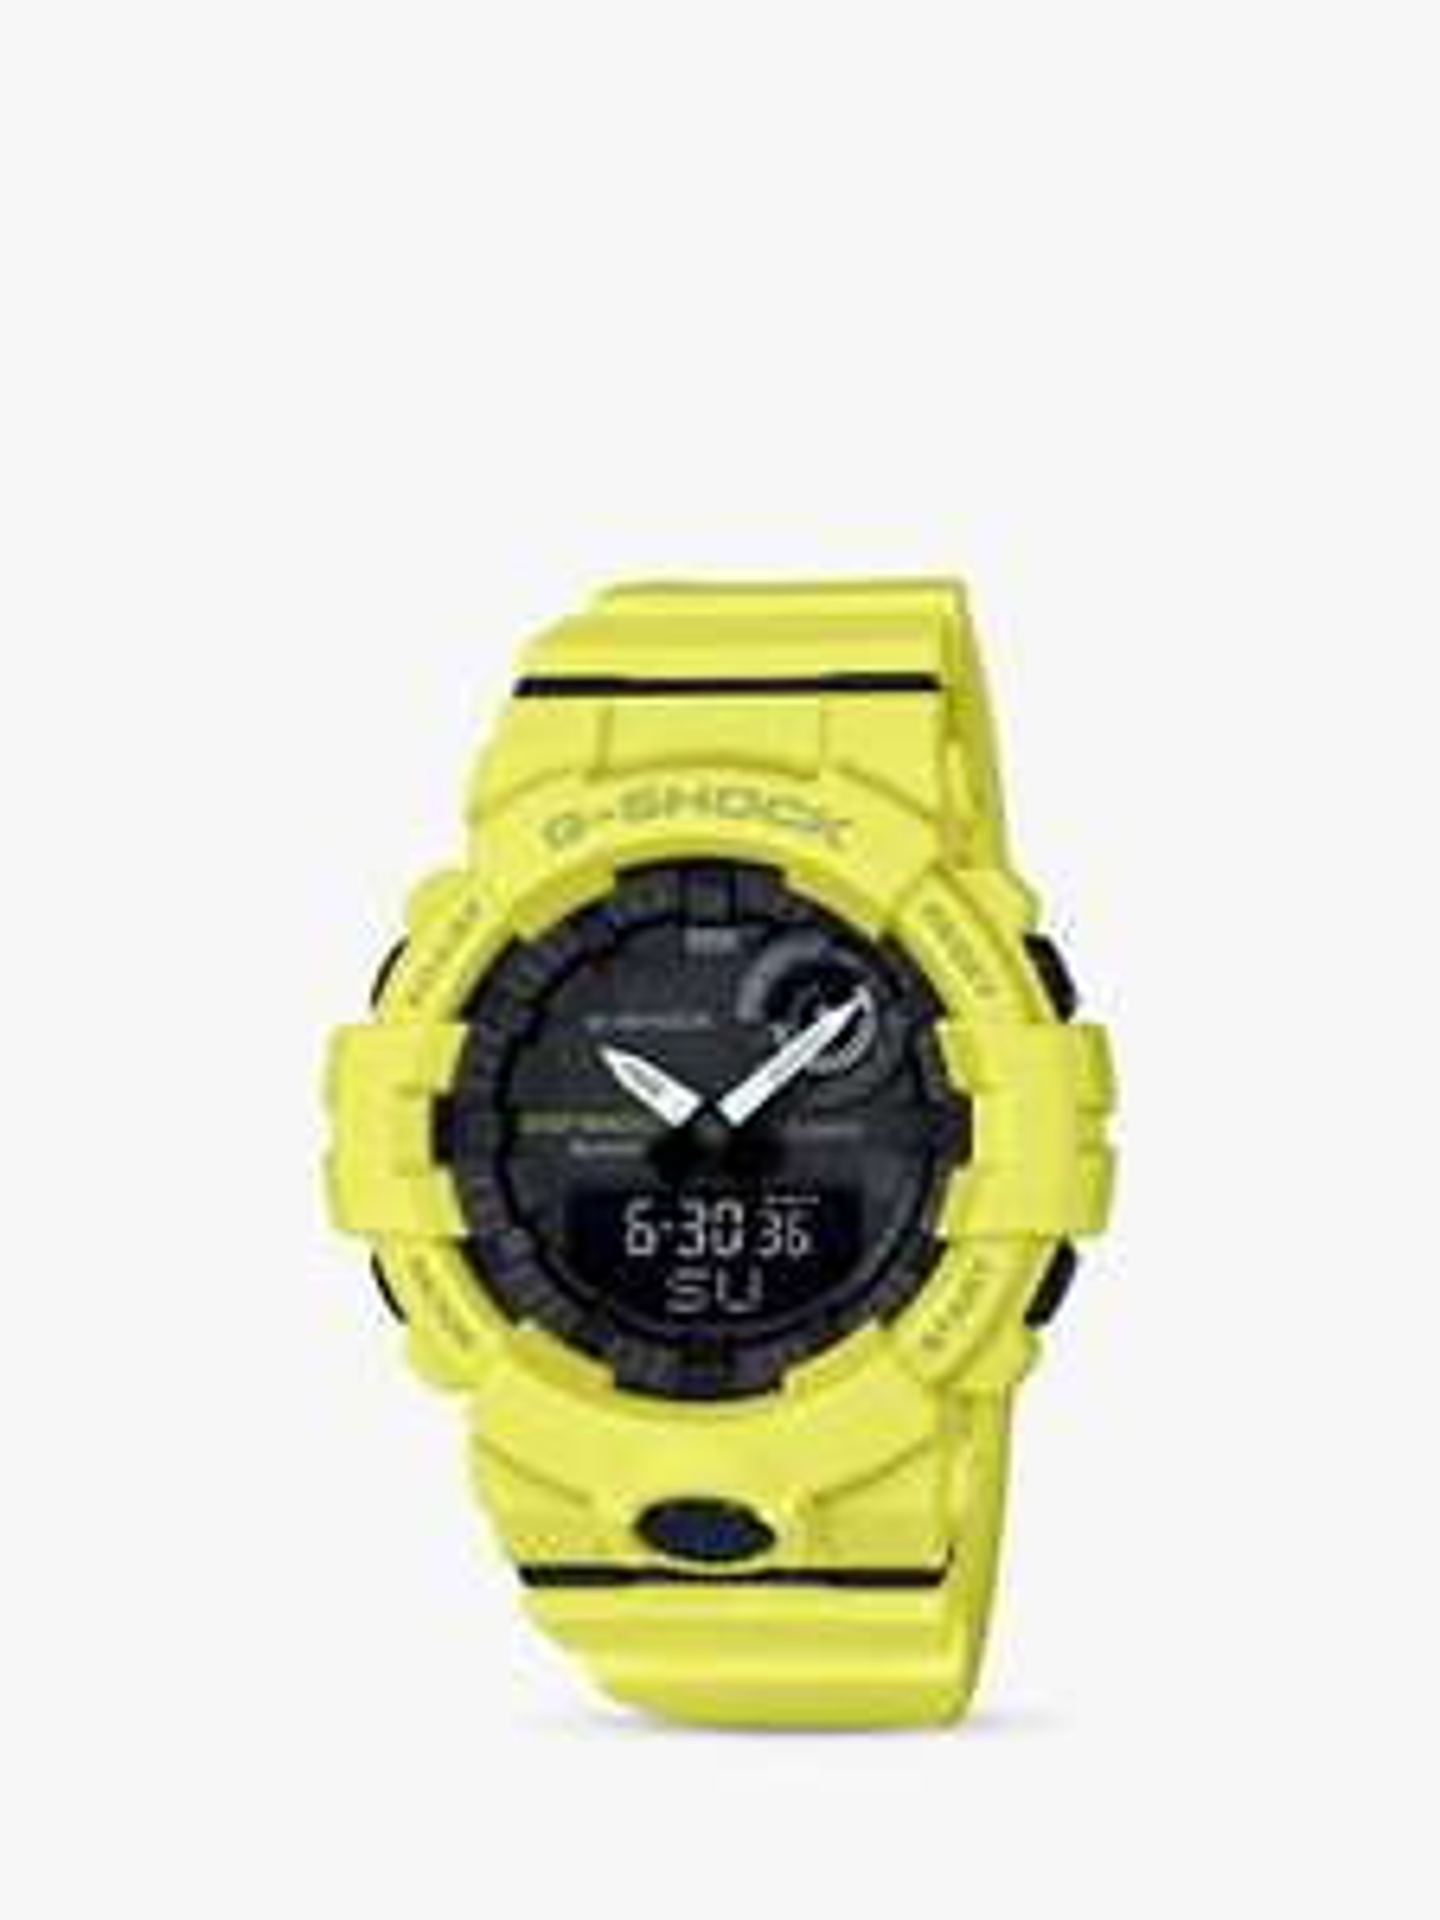 Casio Men's G-Shock Step Tracker Bluetooth Resin Strap Watch, Yellow/Black GBA-800-9AER £59.50 @ John Lewis & Partners